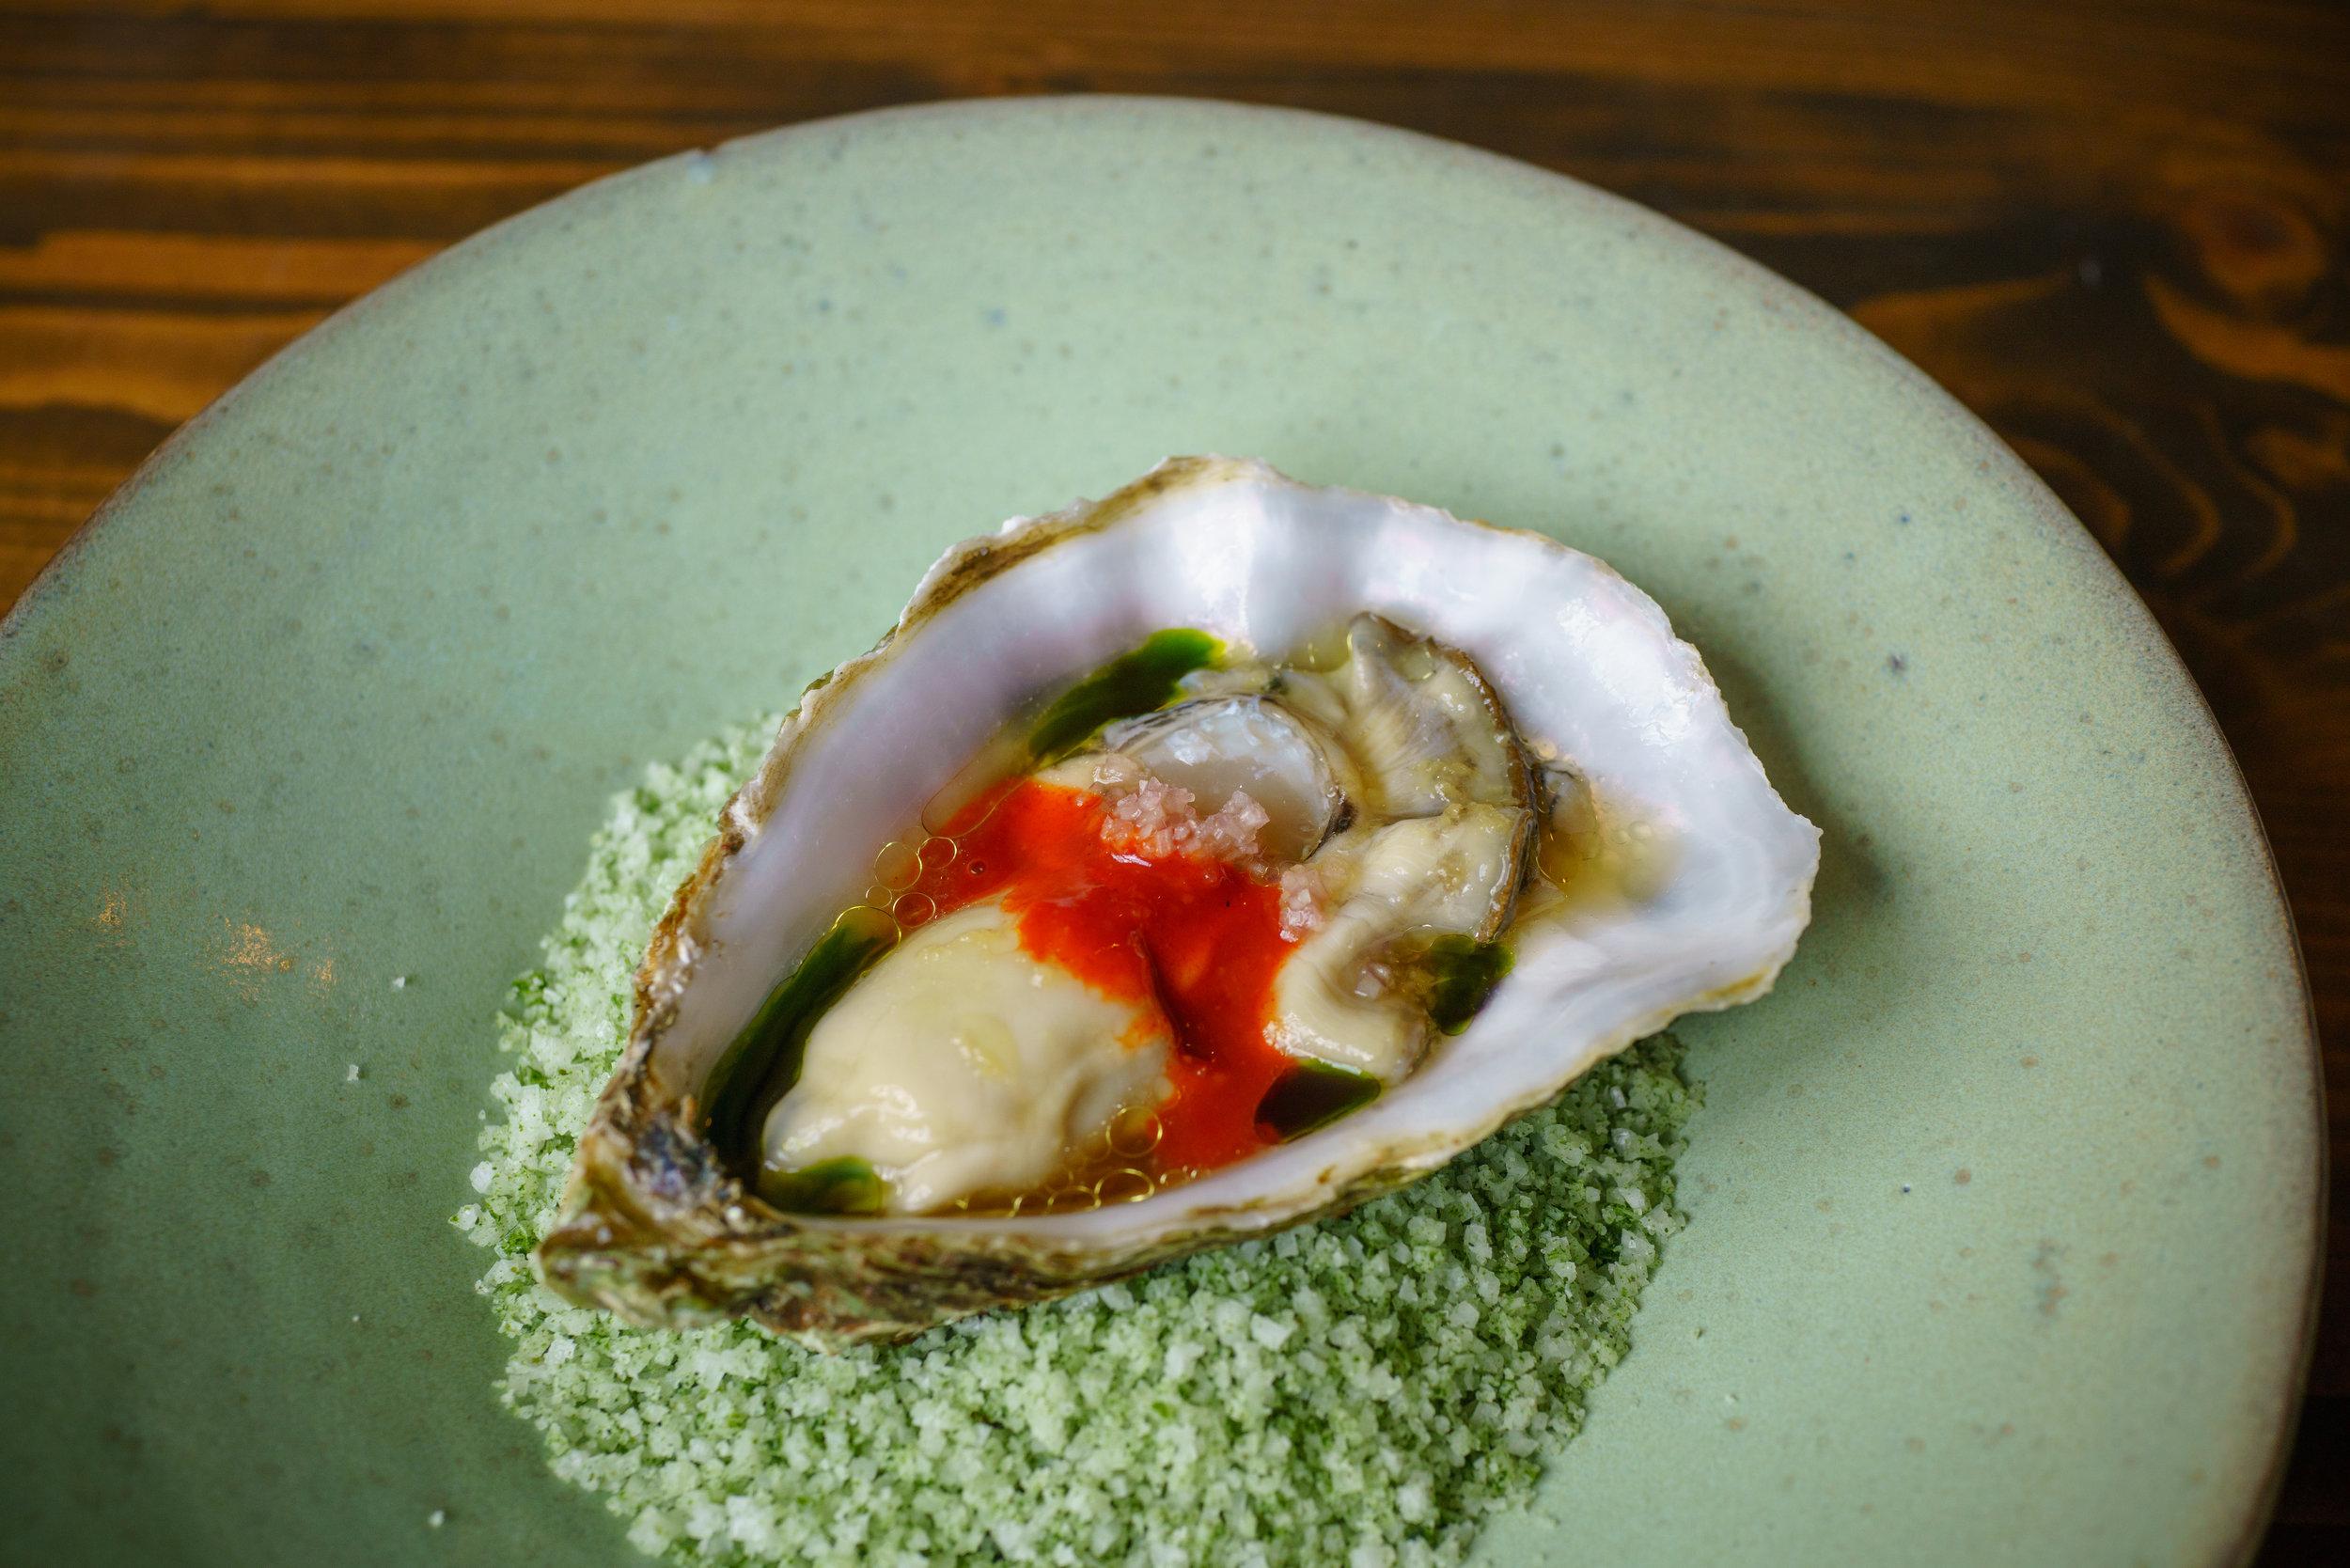 Oyster, Ginger and Lemon, Gochujang